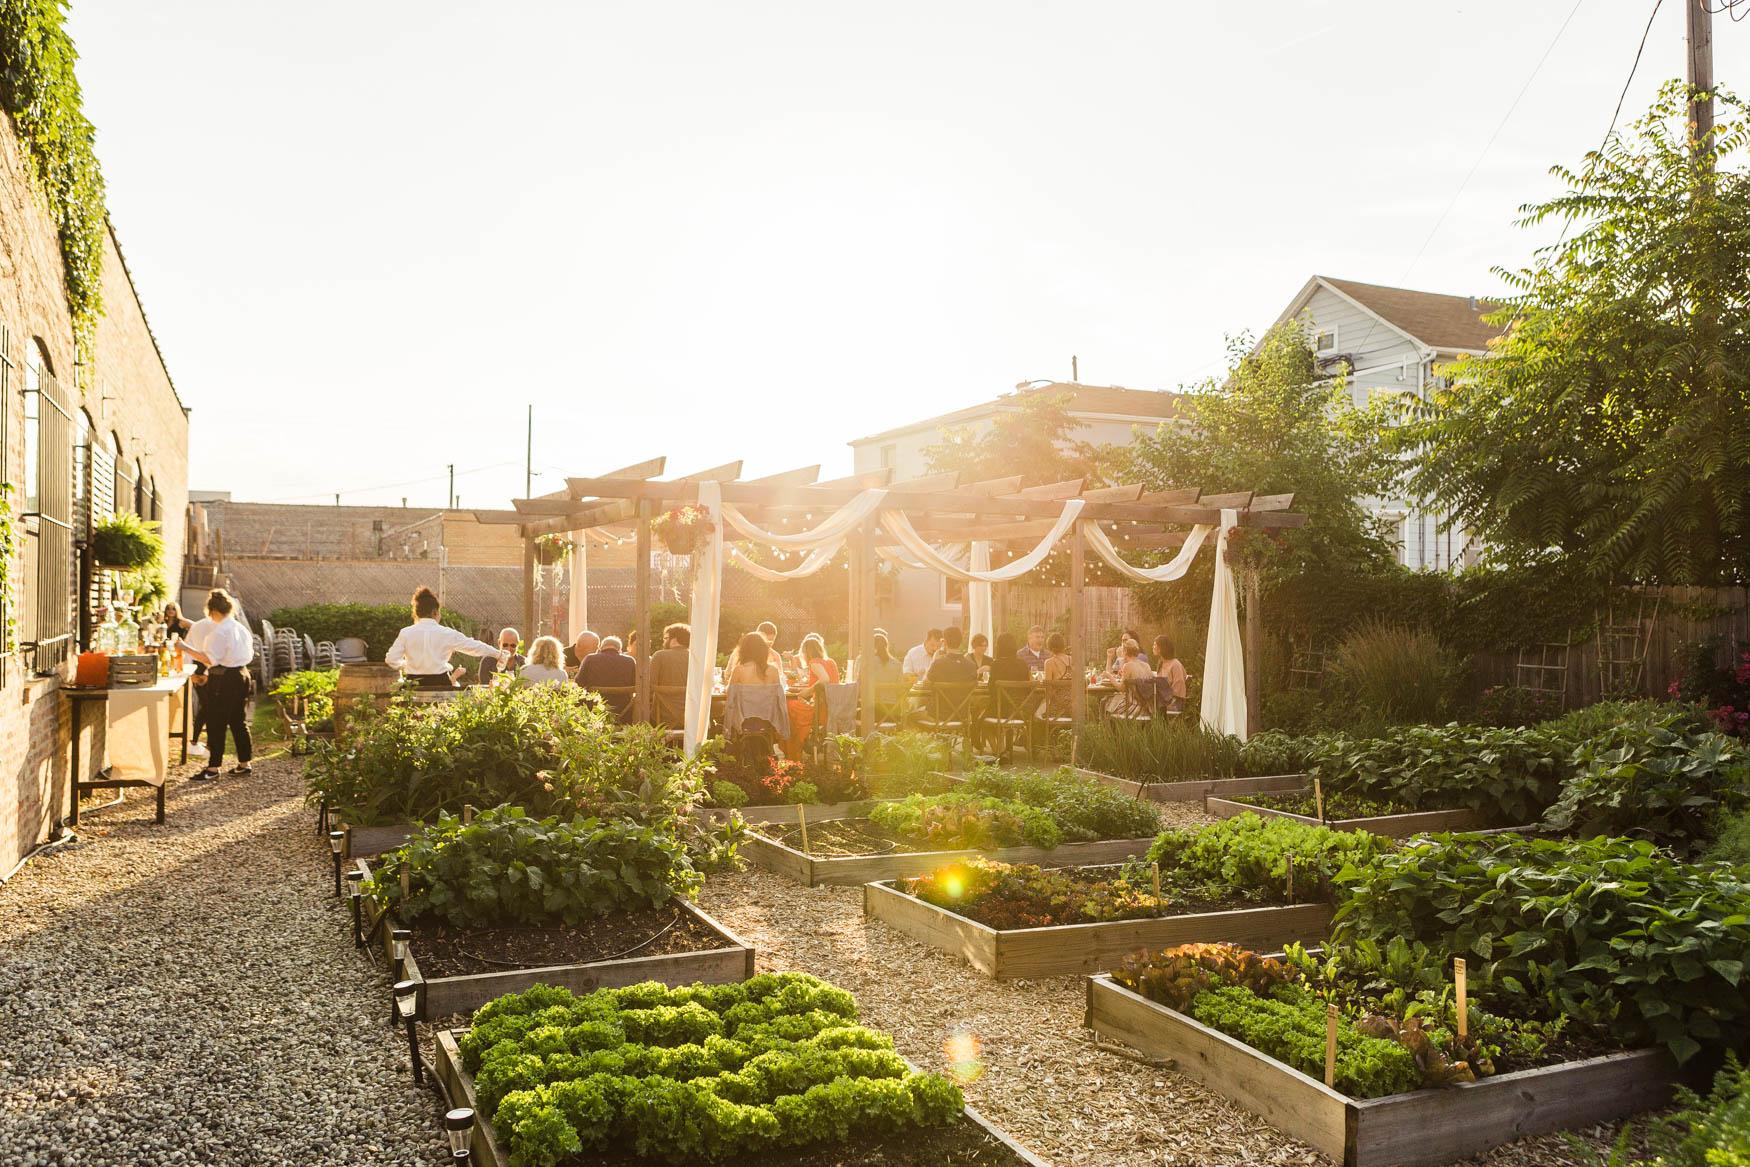 Big Delicious Planet (Farm-to-table restaurant)